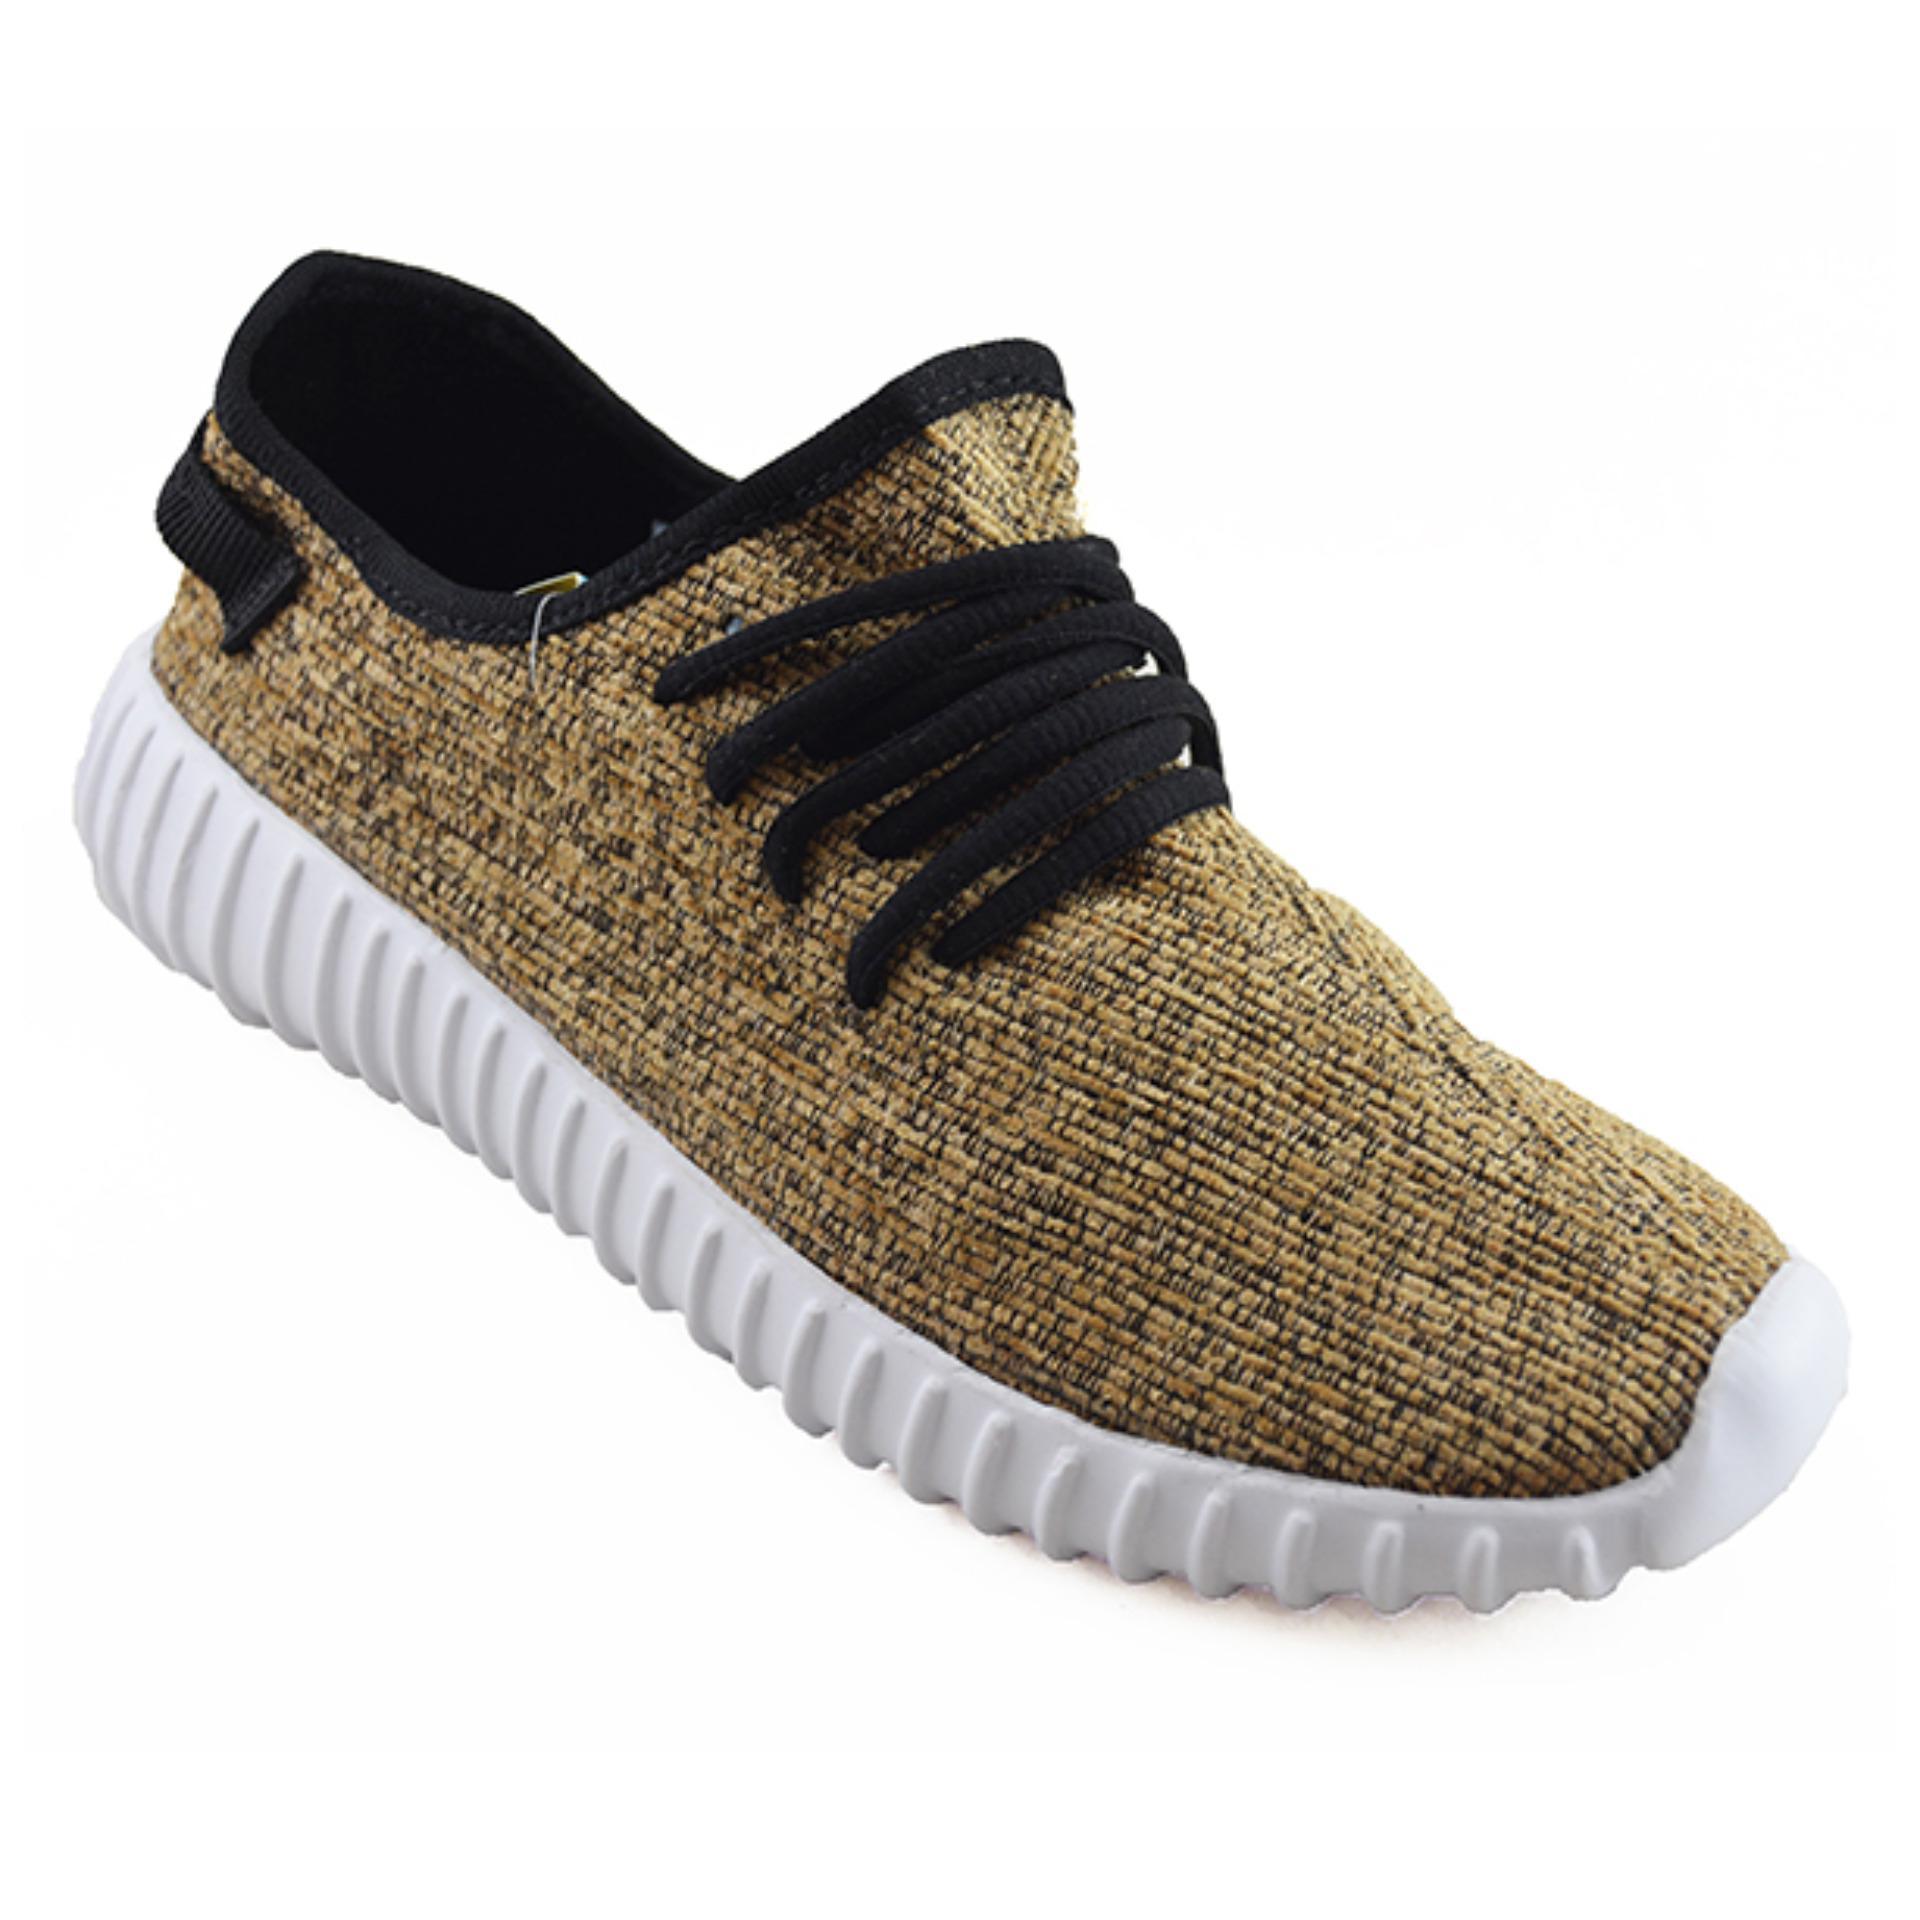 Koketo Zis 04 Sepatu Sneakers Wanita Daftar Harga Terkini Dan Gabino Hiley Silver Gf7e11 10